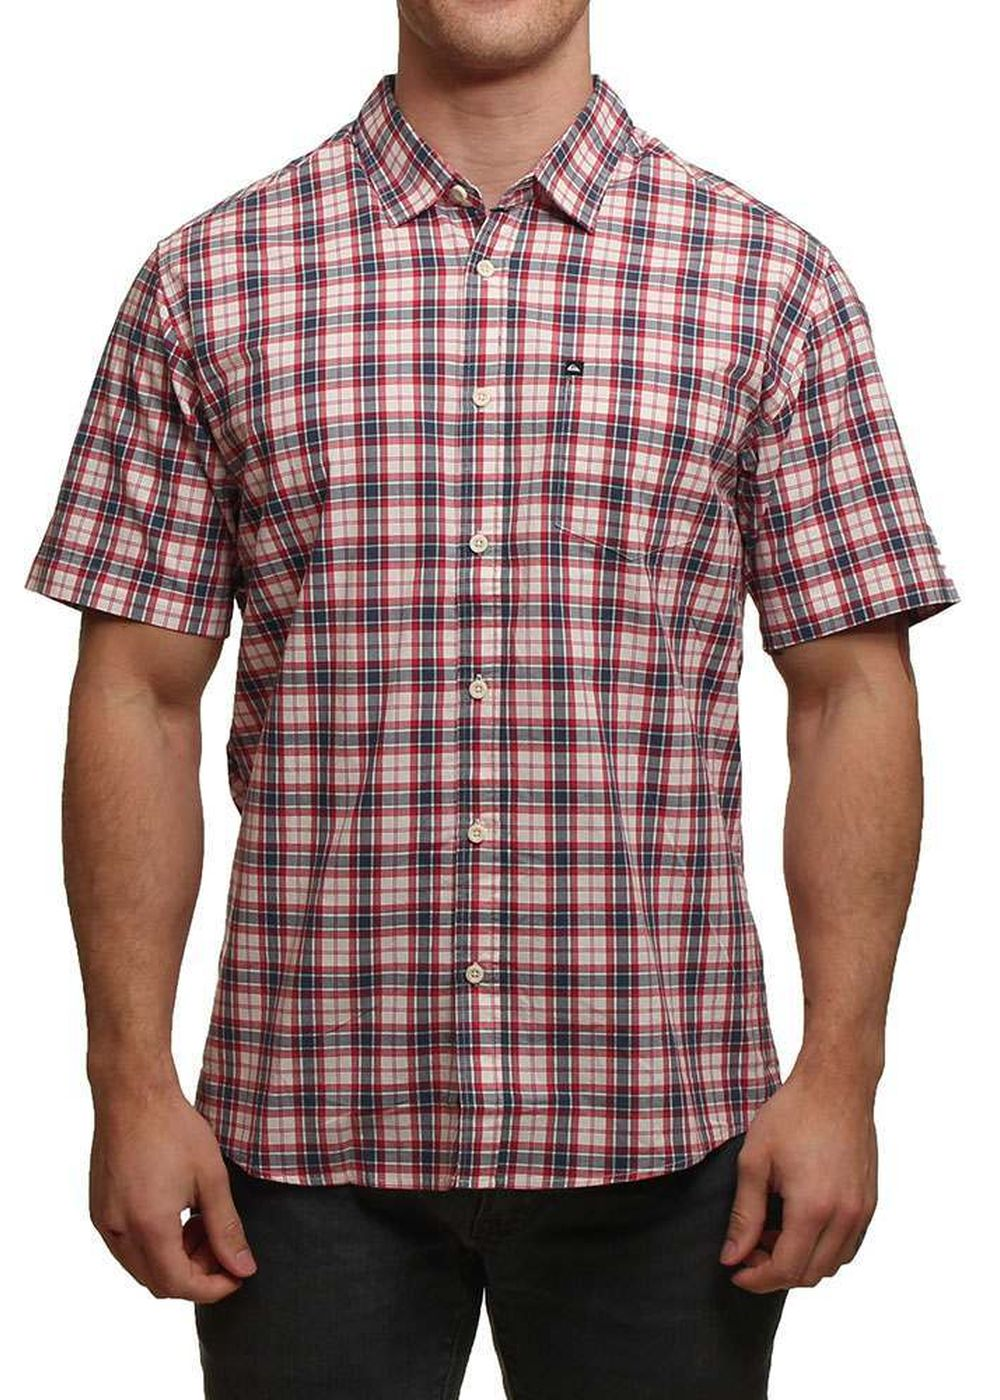 quiksilver-everyday-check-ss-shirt-dark-denim